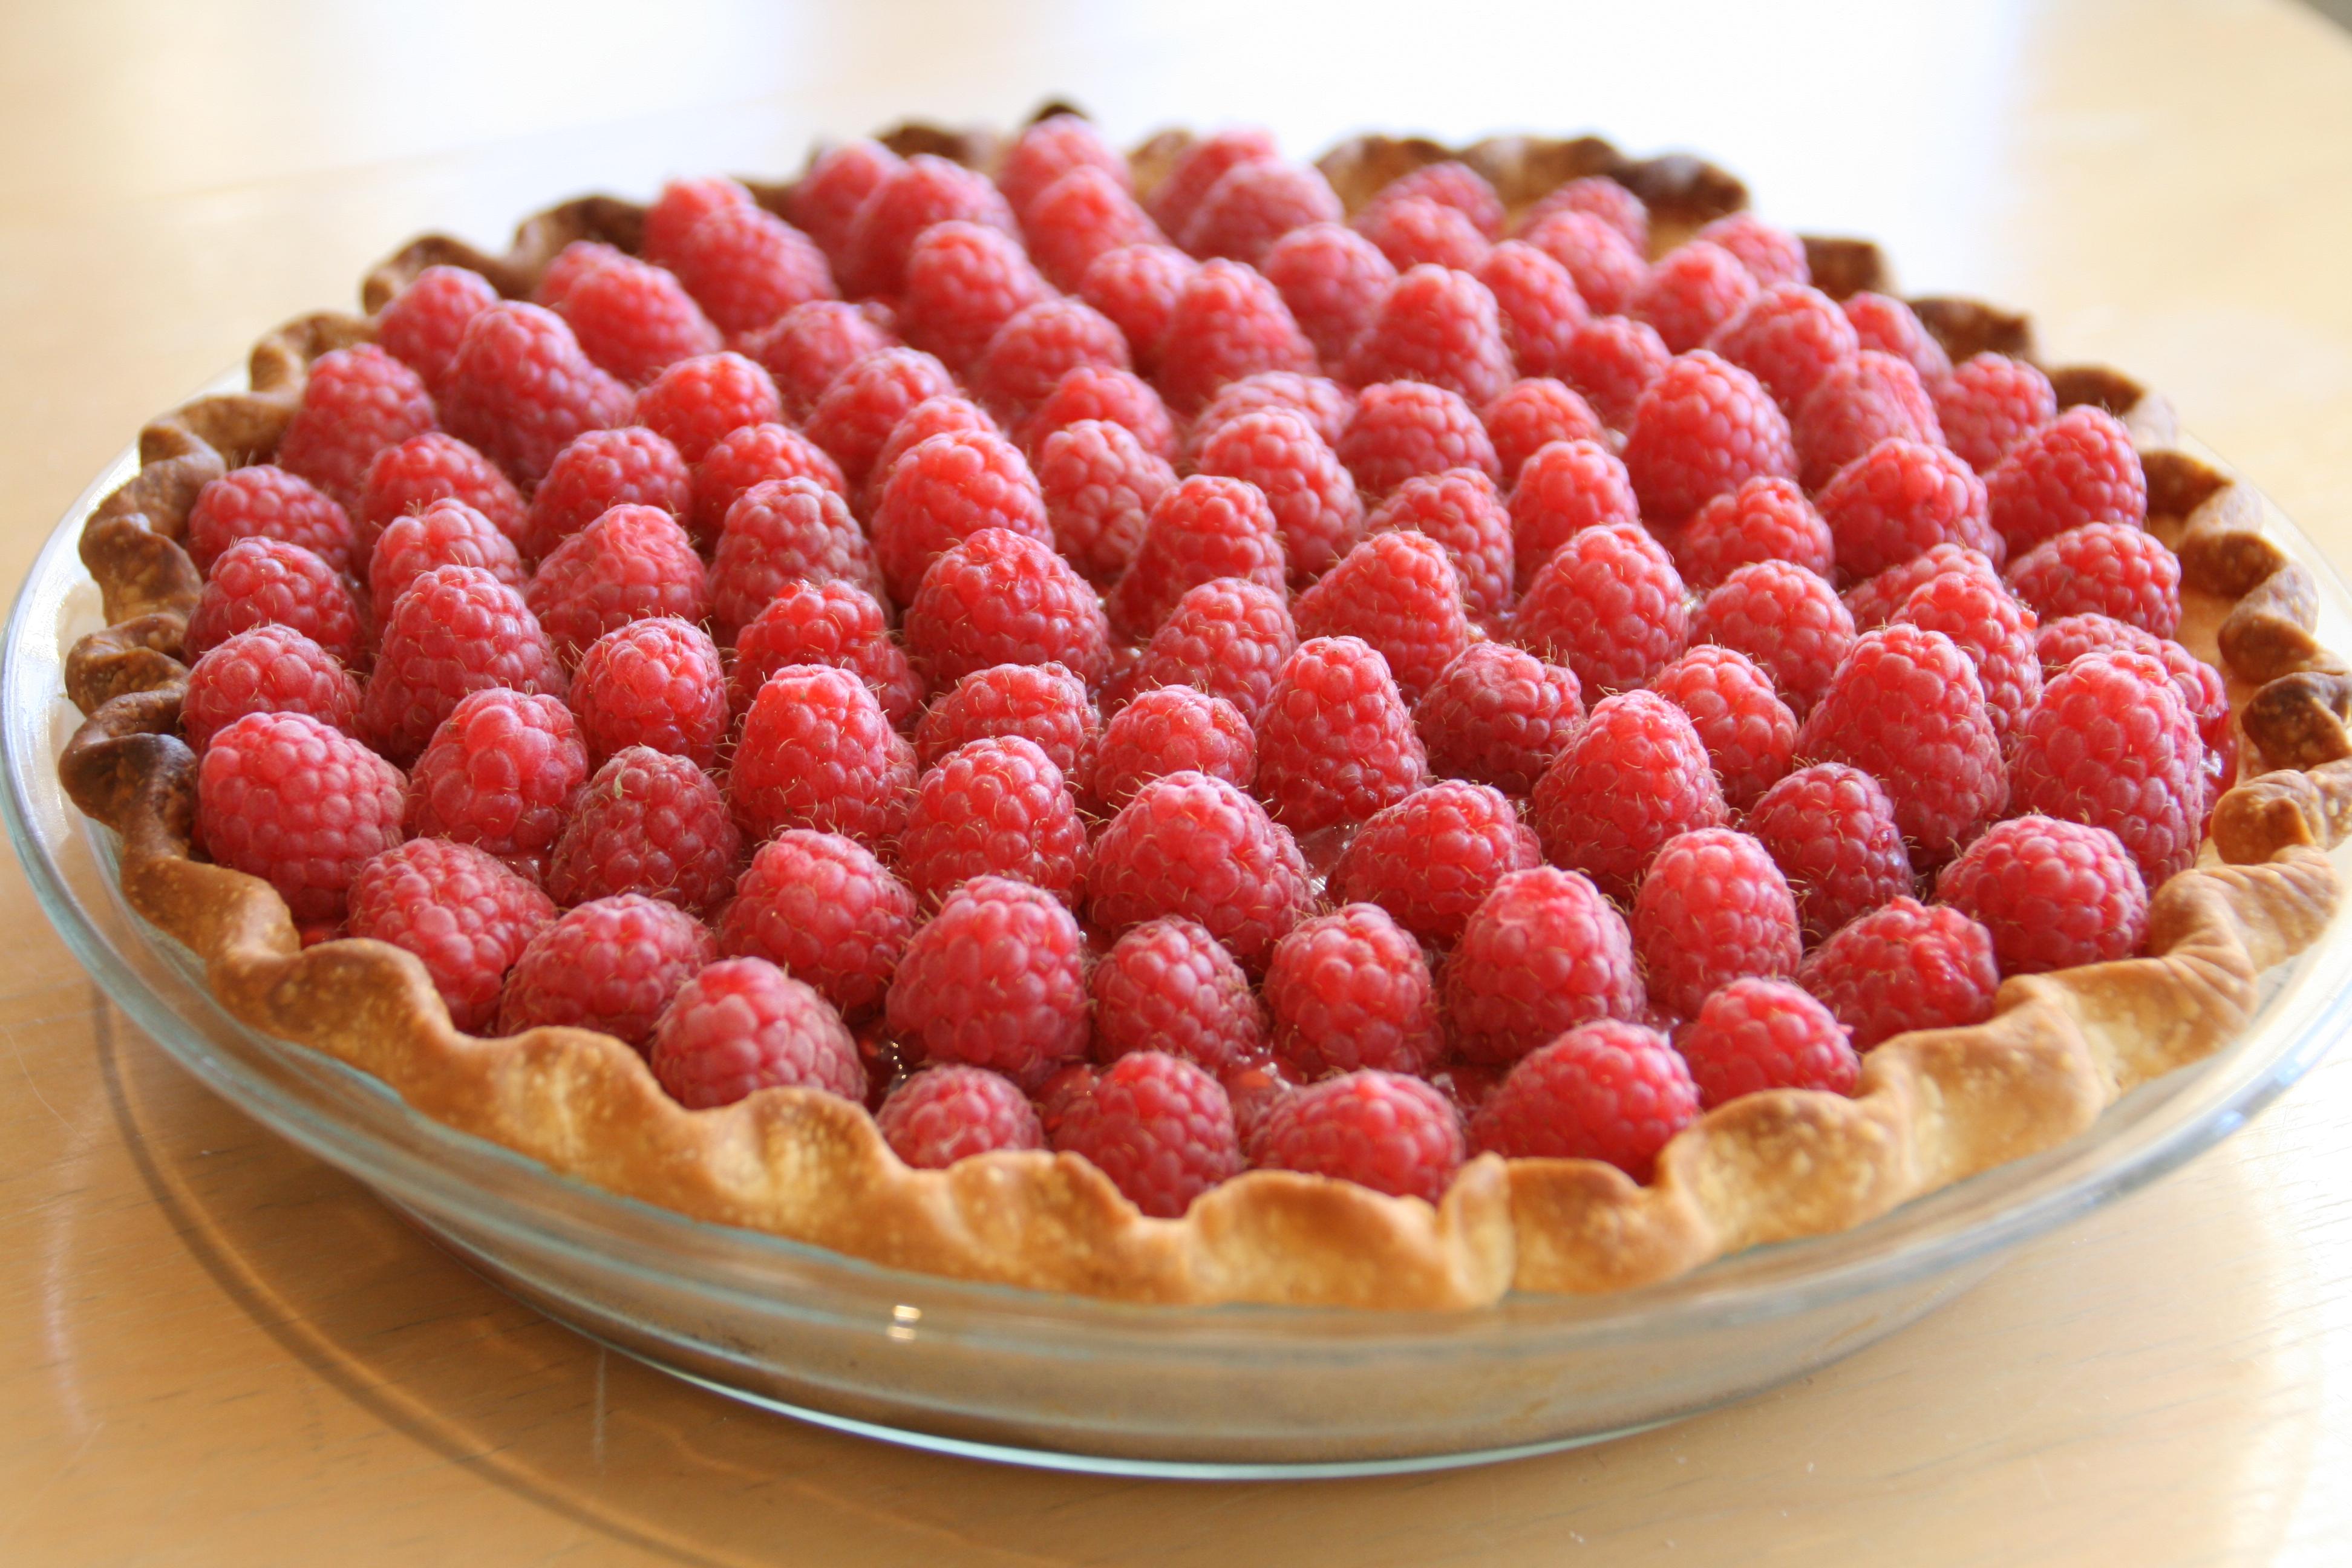 raspberry pie raspberry chocolate pie thats actually good for you ...